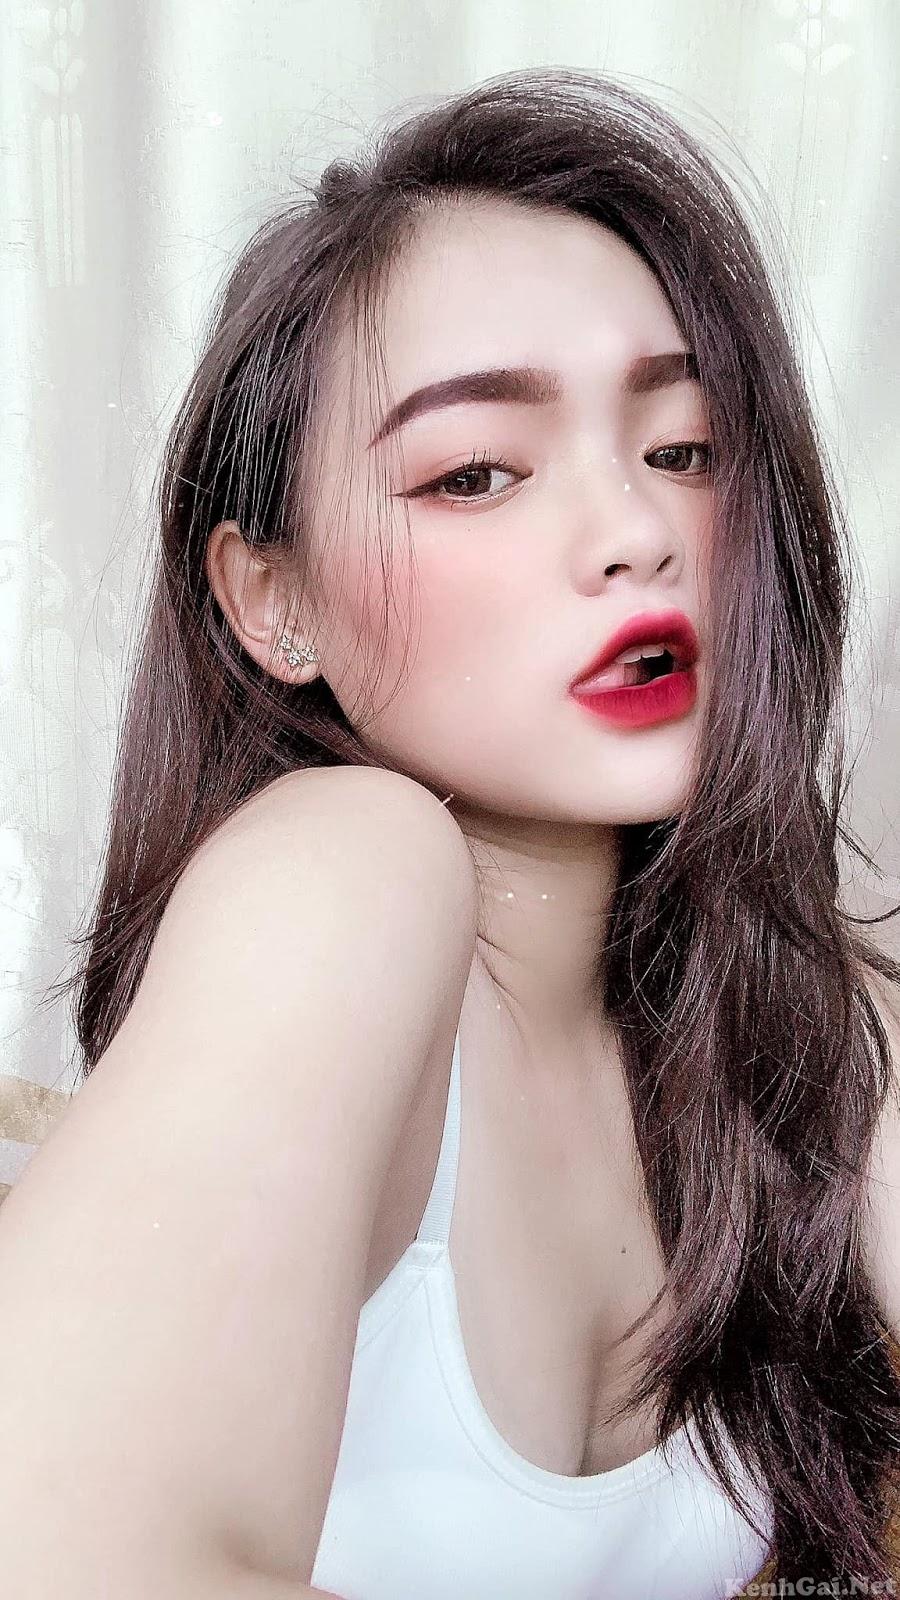 Hotgirl Trương Minh Châu   E-CUP   WWW.DEPVAILON.COM   Page 1